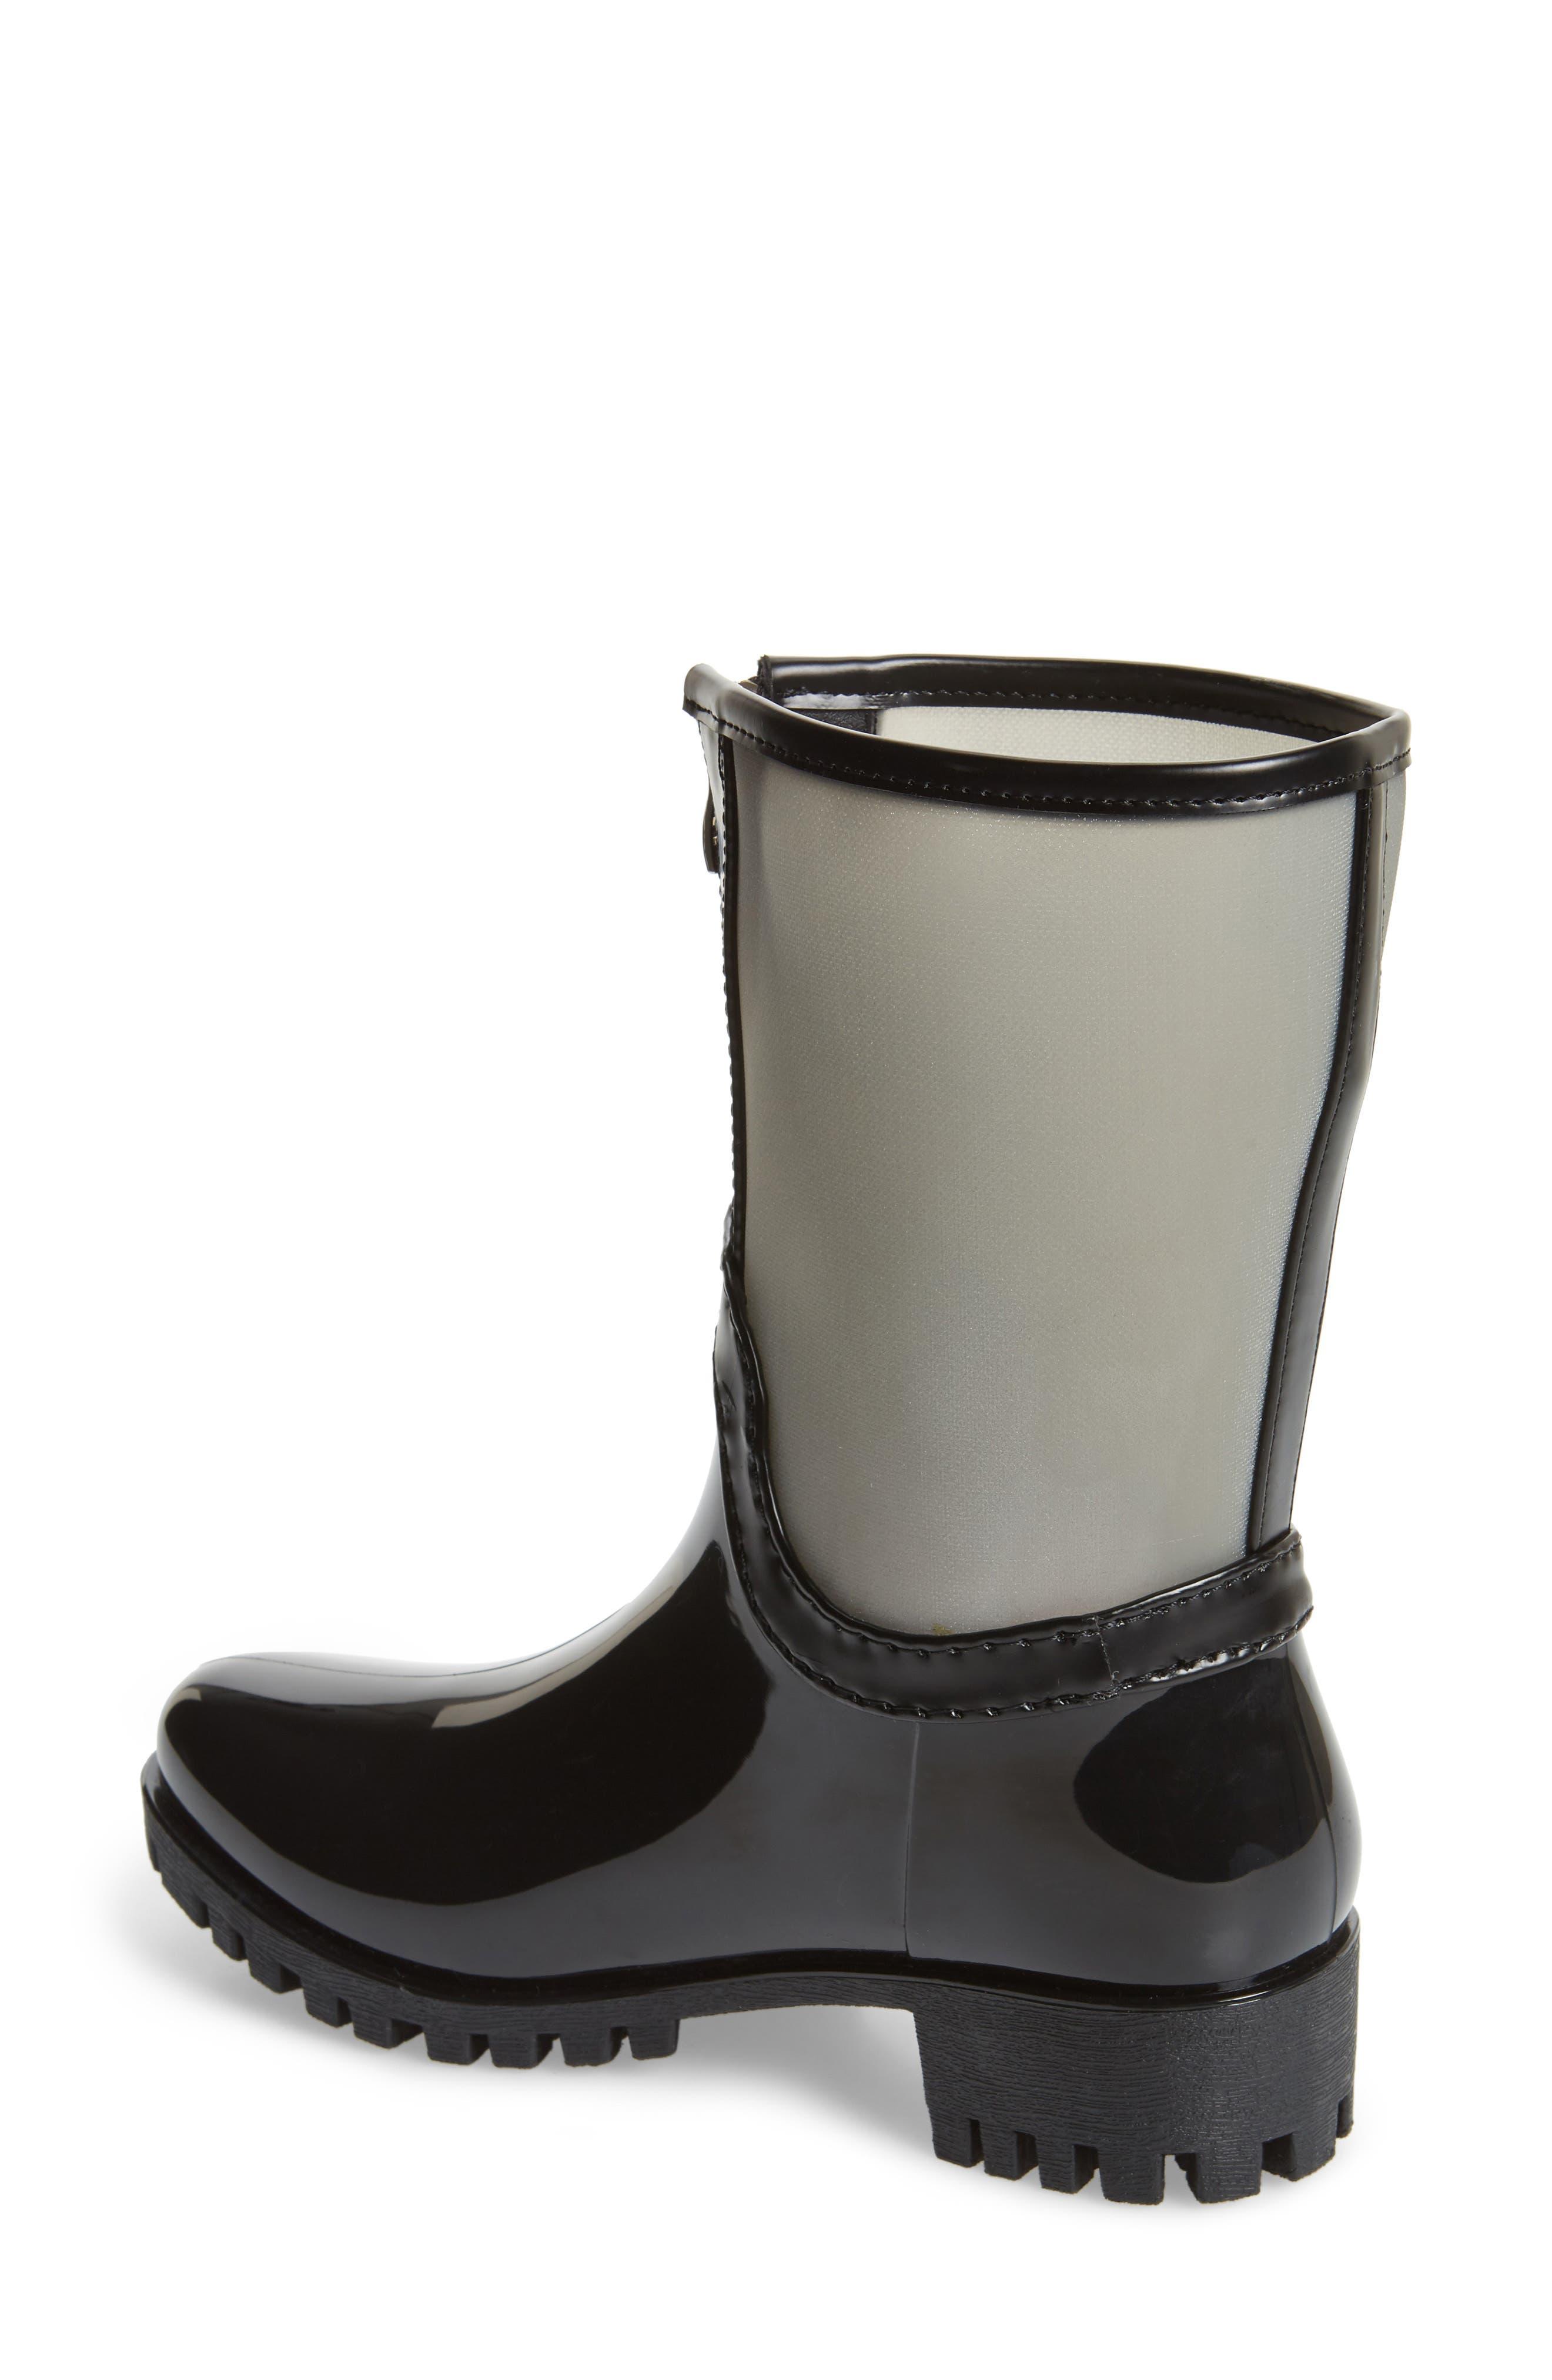 DÄV, Dryden Sheer Waterproof Boot, Alternate thumbnail 2, color, GREY FABRIC